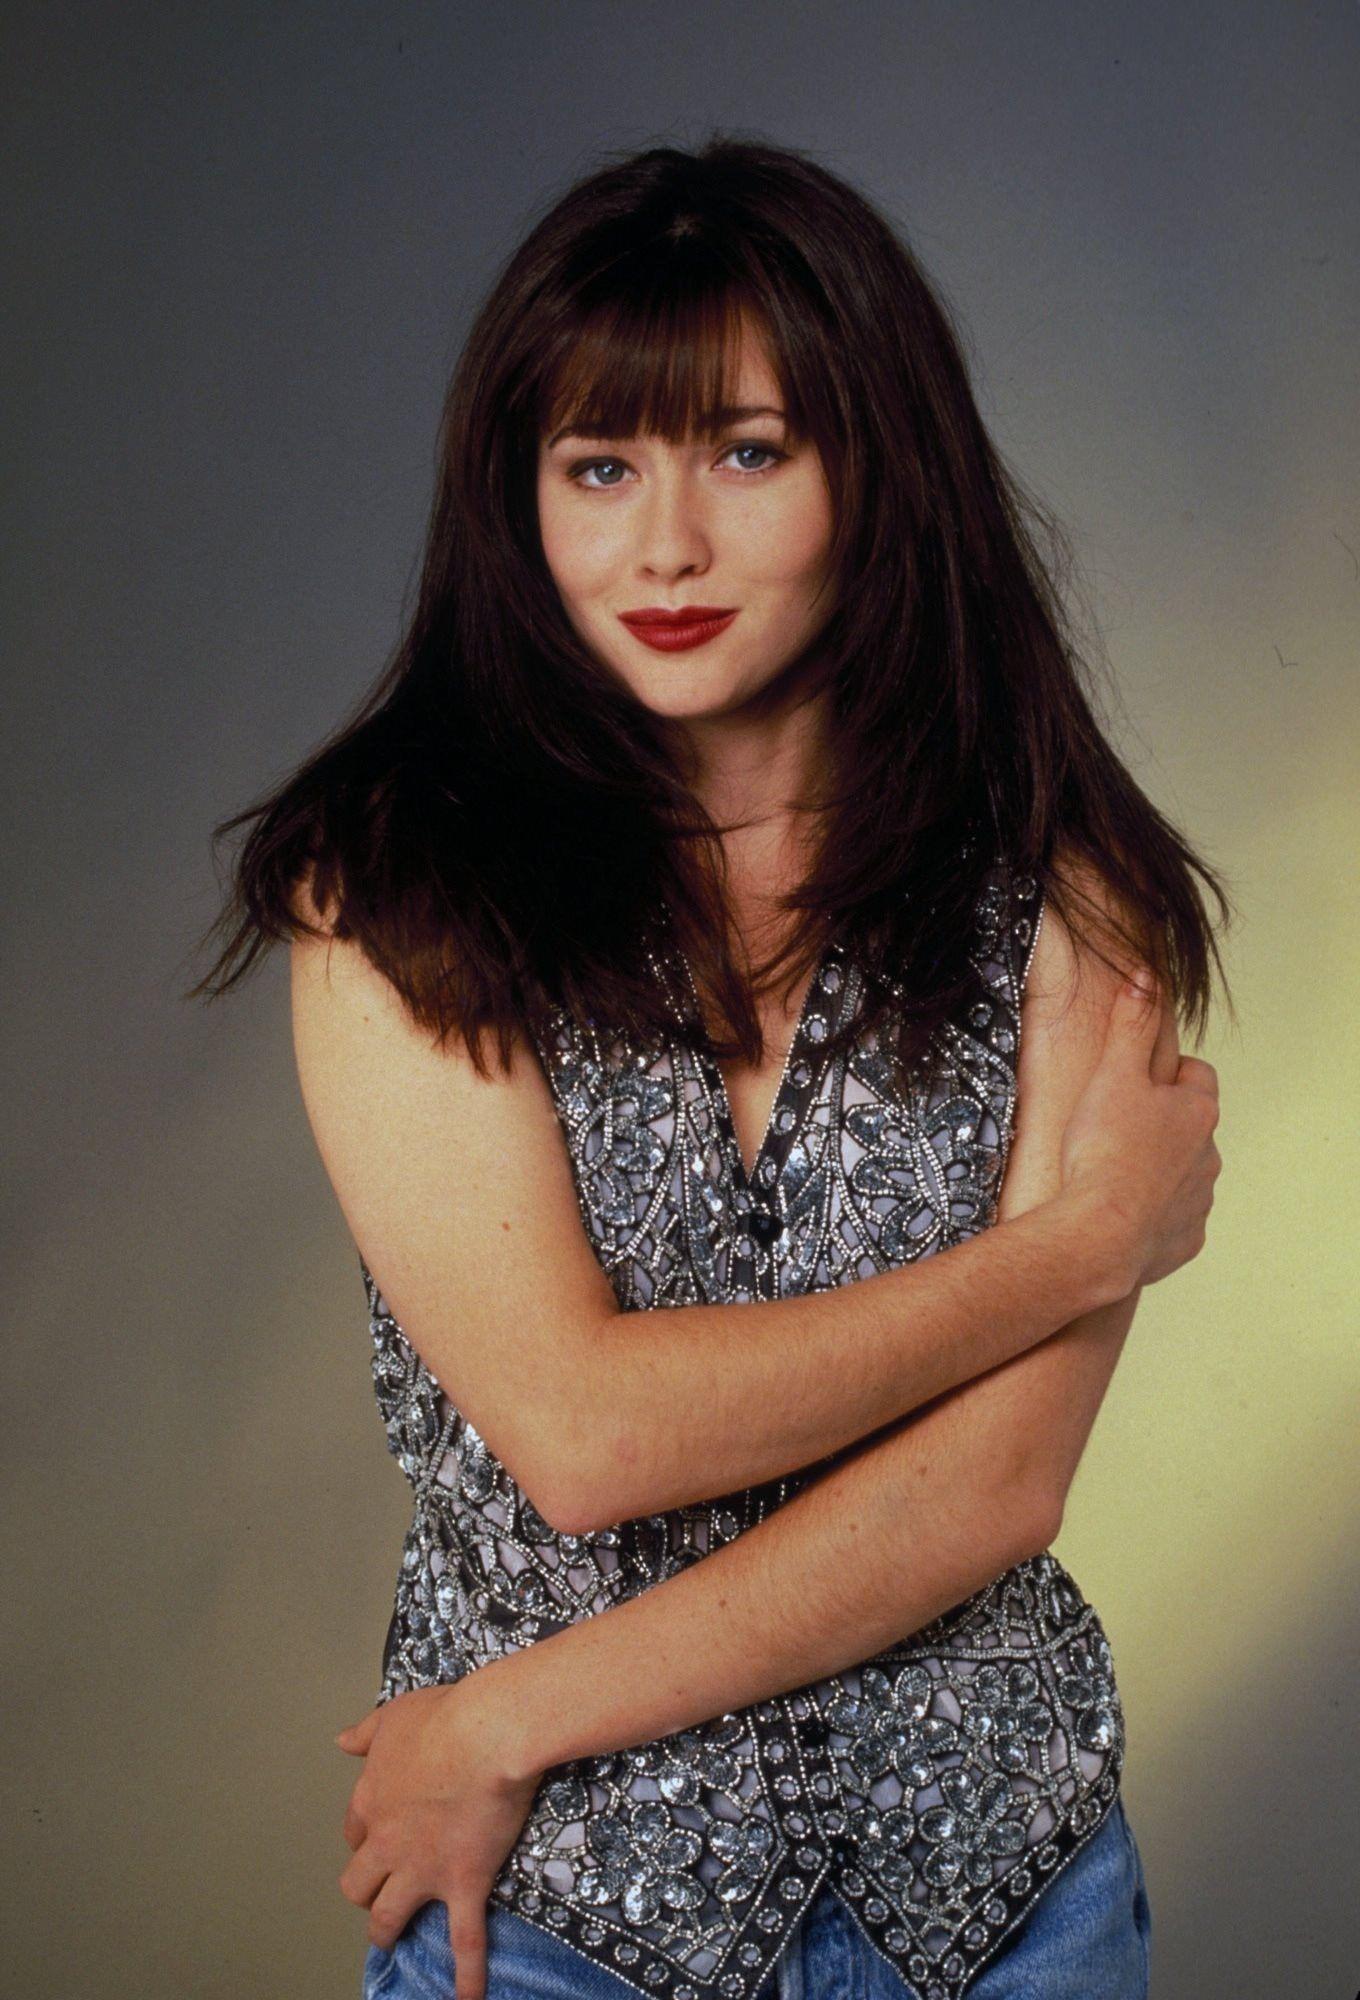 Shannen Doherty Shannen doherty, Beverly hills 90210, Celebs